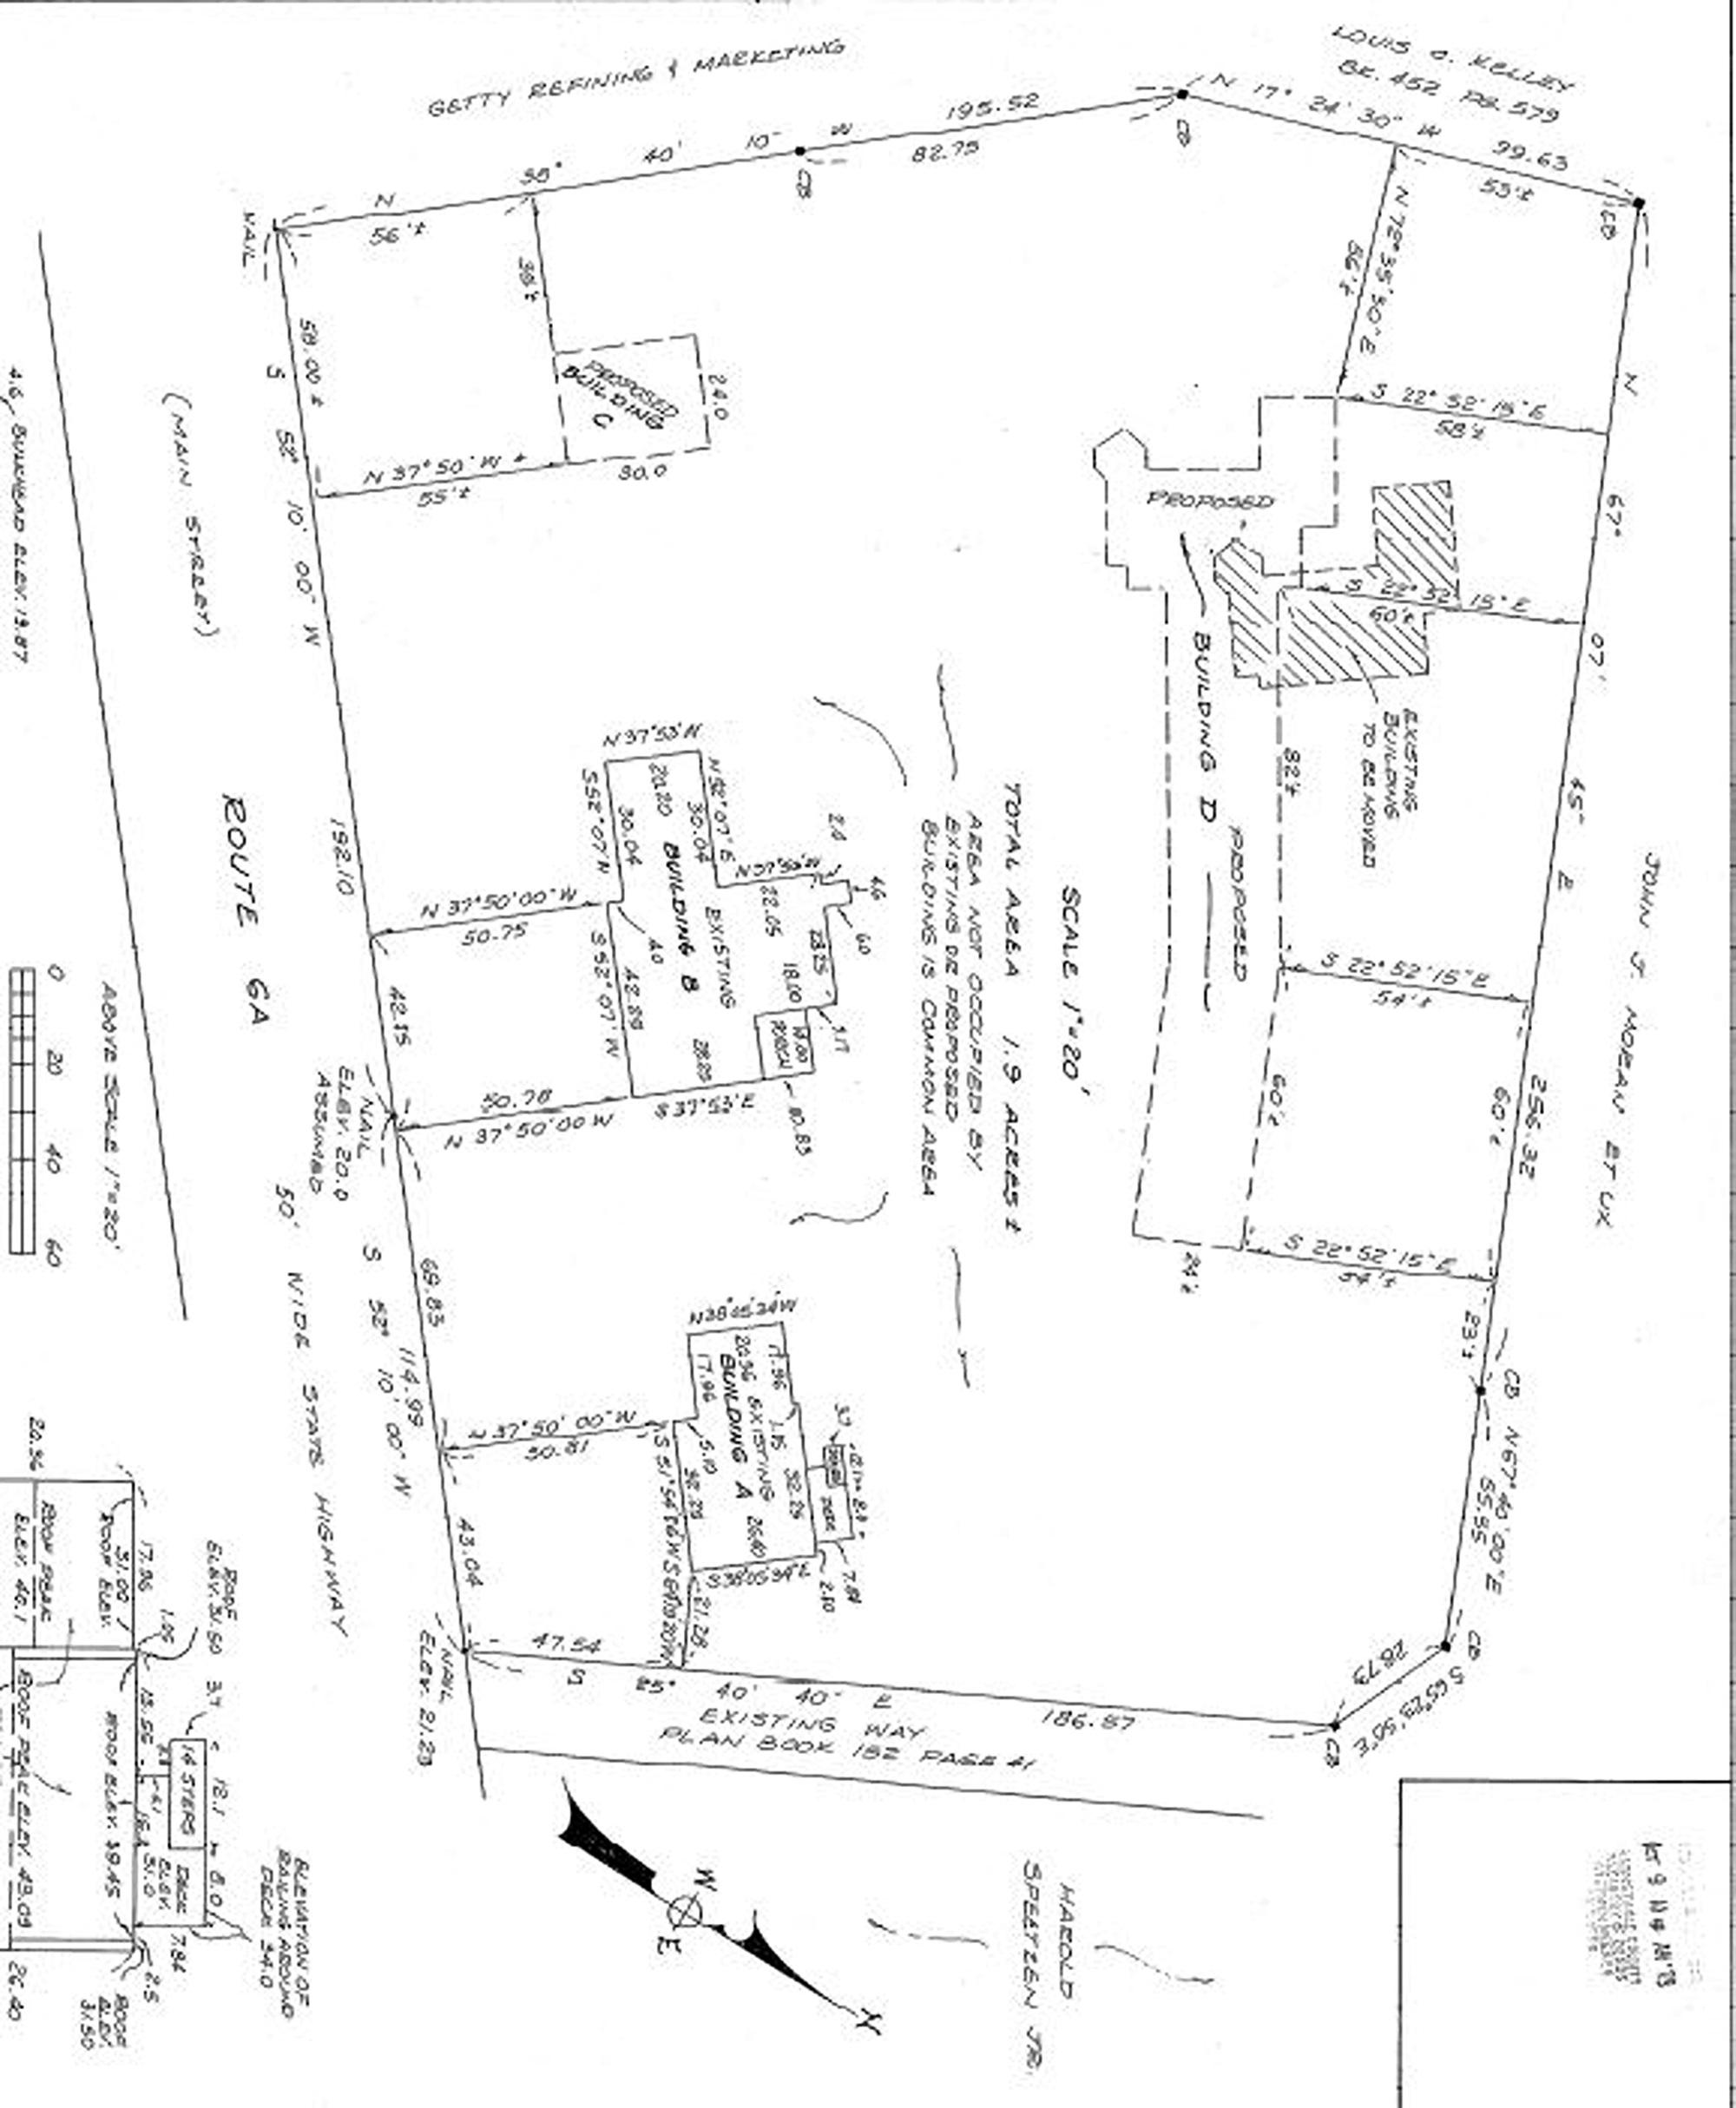 700 Route 6A, Dennis Land Plan